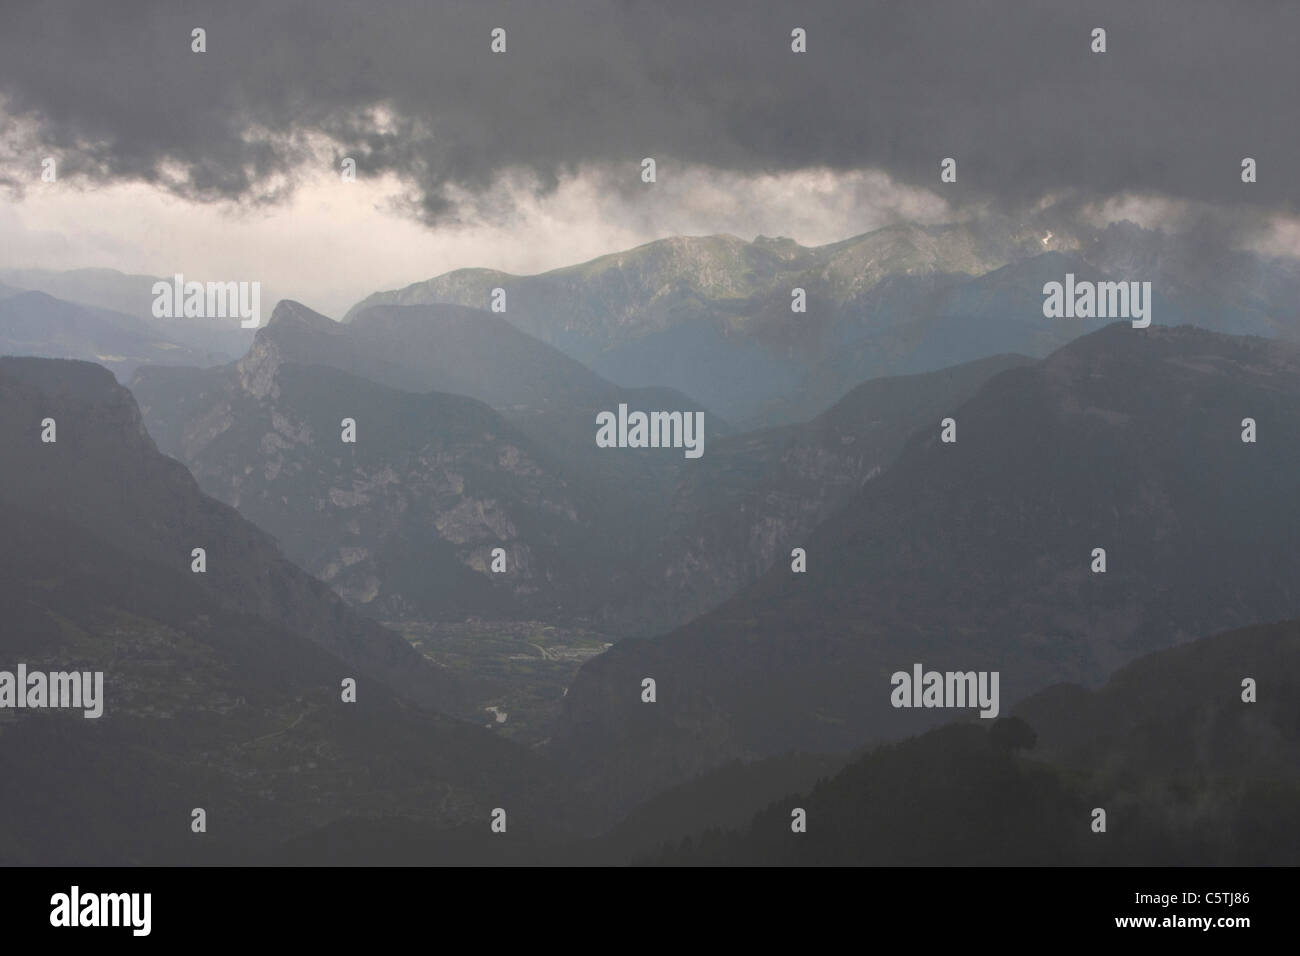 Italia, dolomitas, paisaje de montaña, el clima tormentoso Imagen De Stock